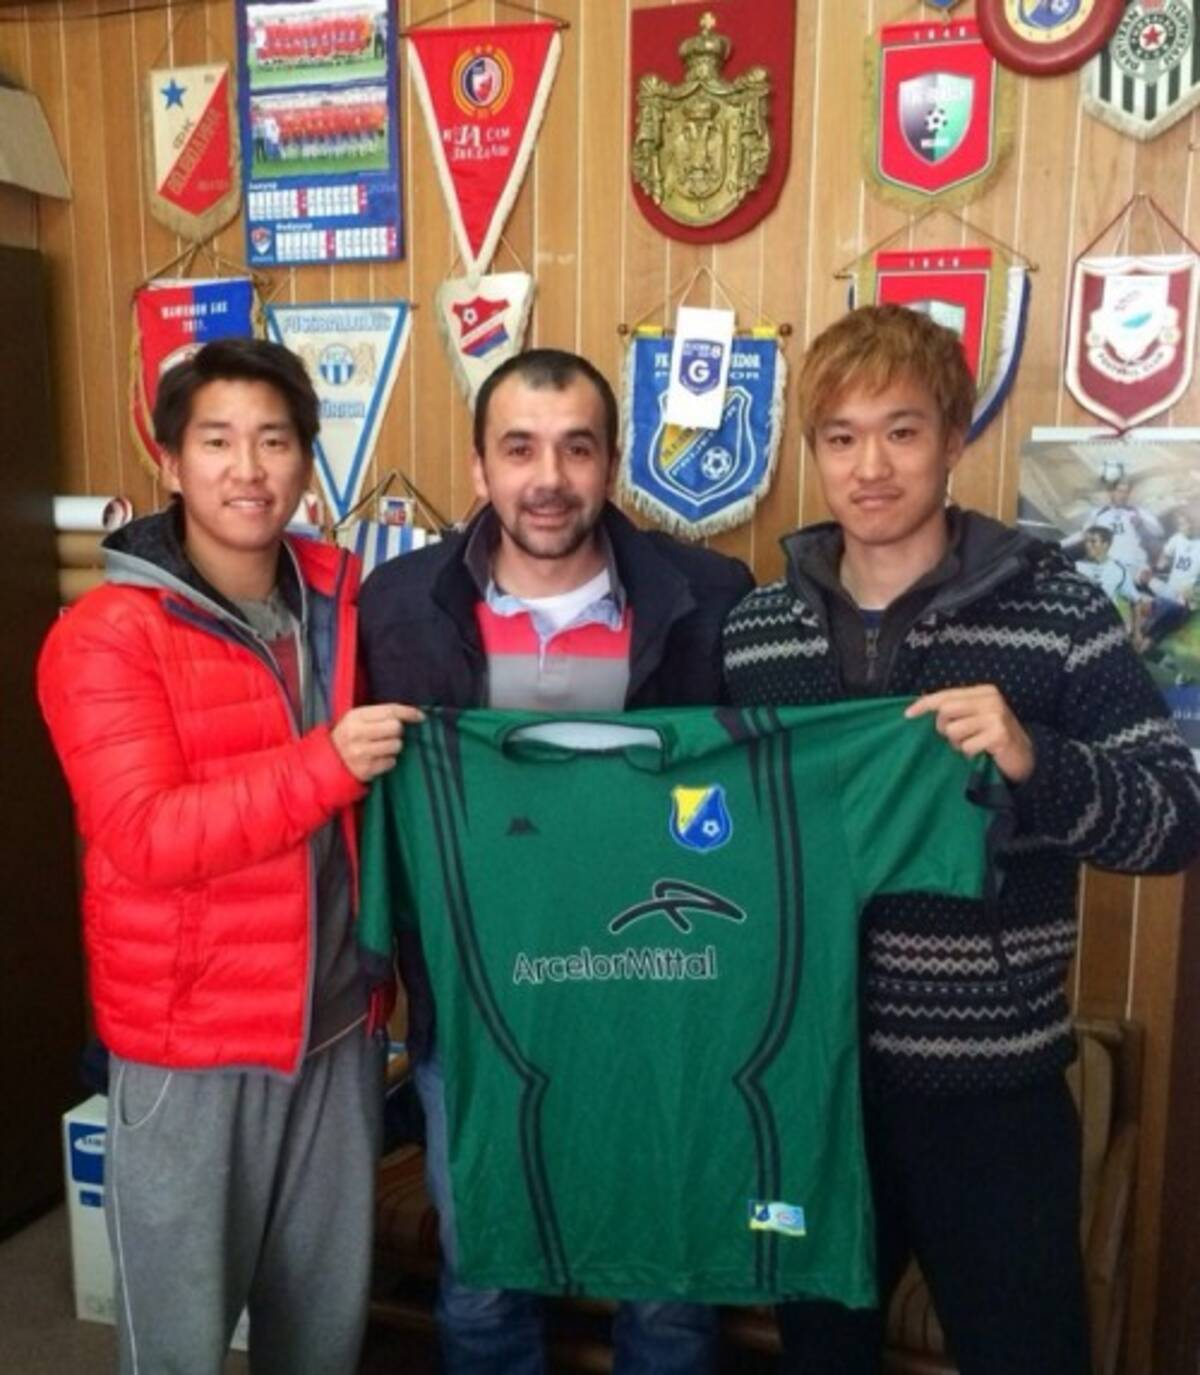 ac494d16c0418d 川辺隆弥、土肥健太の日本人2選手がボスニア1部リーグに移籍 (2014年2月27日) - エキサイトニュース